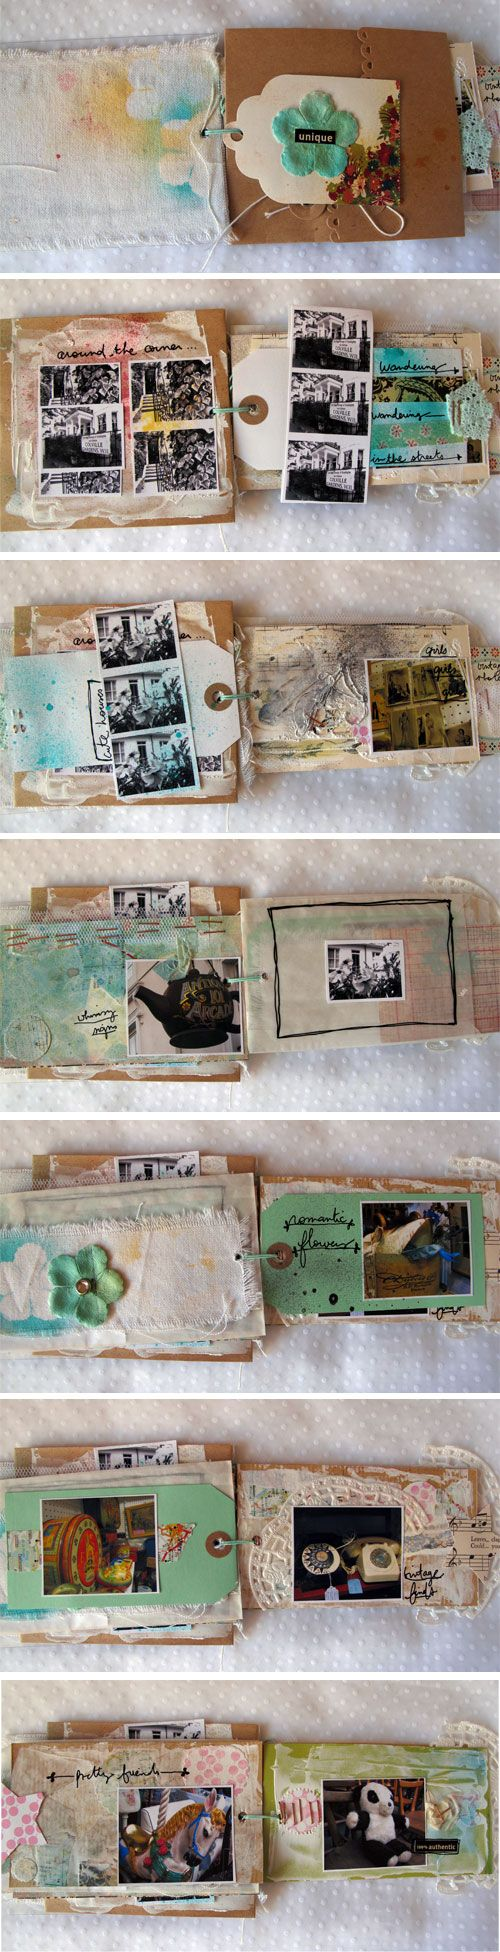 Junk Journal - @Sadey Whitlock Whitlock Whitlock Whitlock Whitlock Whitlock Vogel you Should Do This With Travel Tickets, bus passes, etc. ...